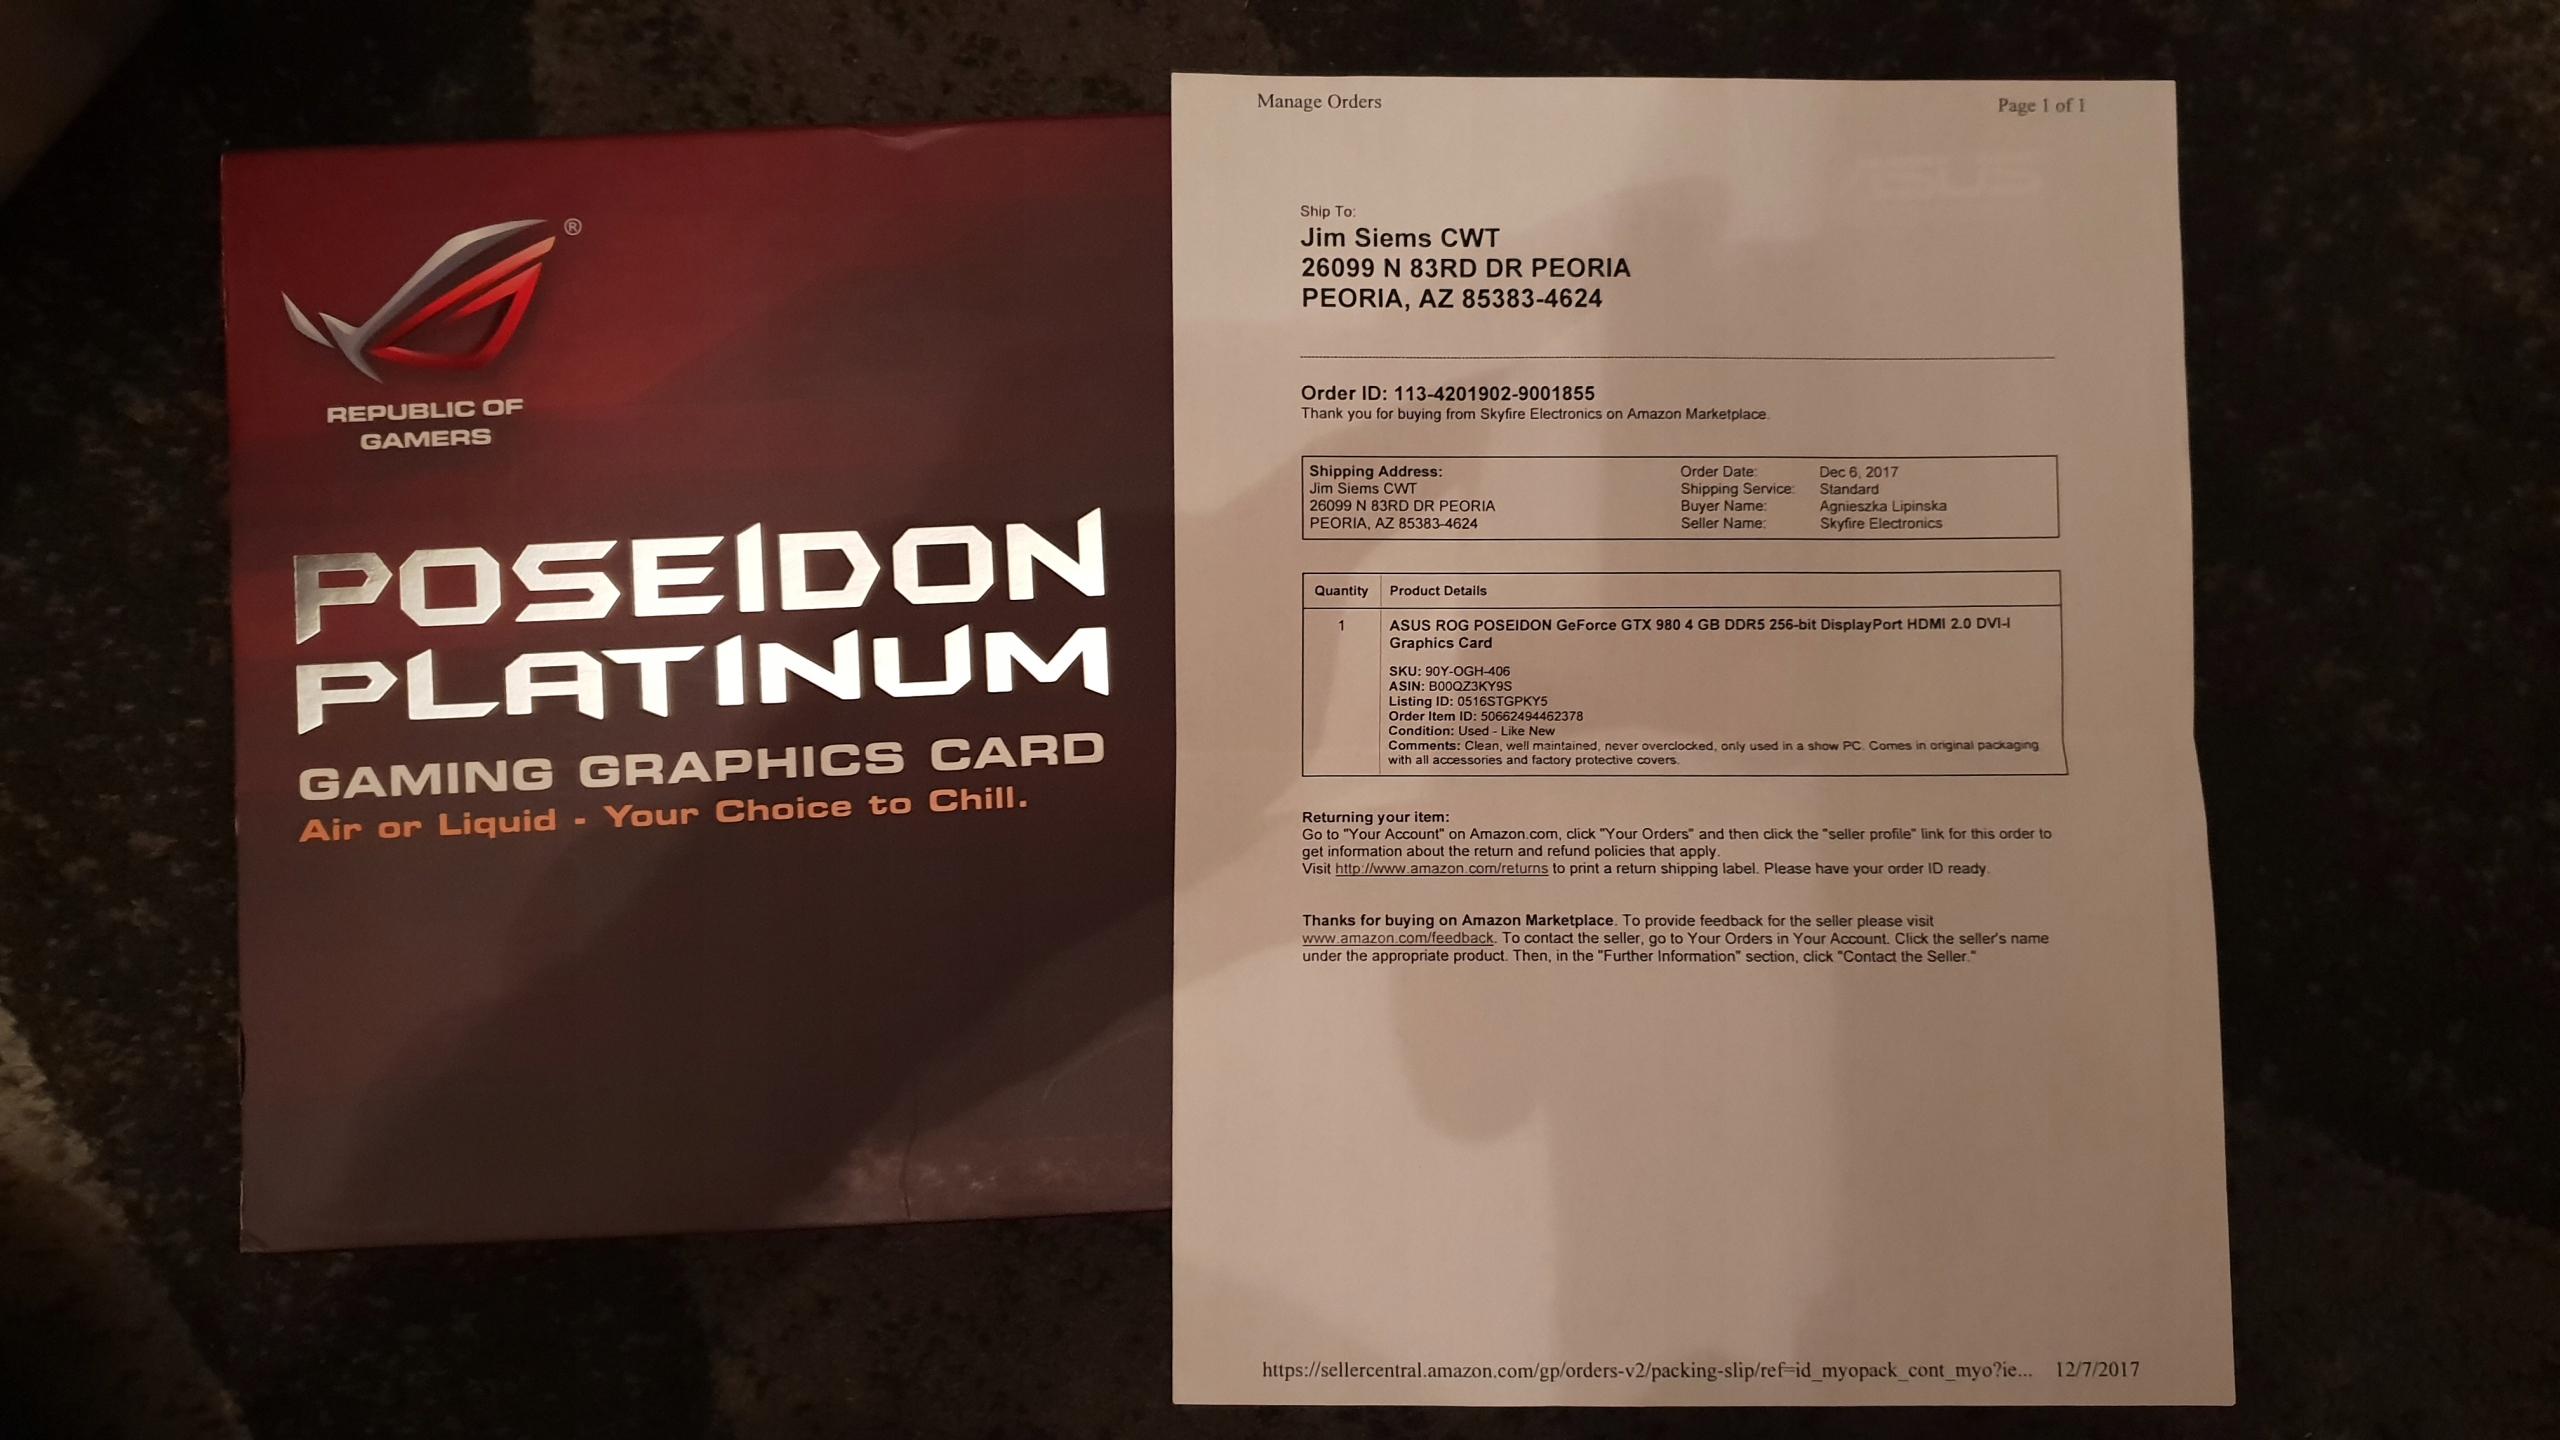 ASUS 980 GTX POSEIDON PLATINUM STAN IDEALNY UNIKAT